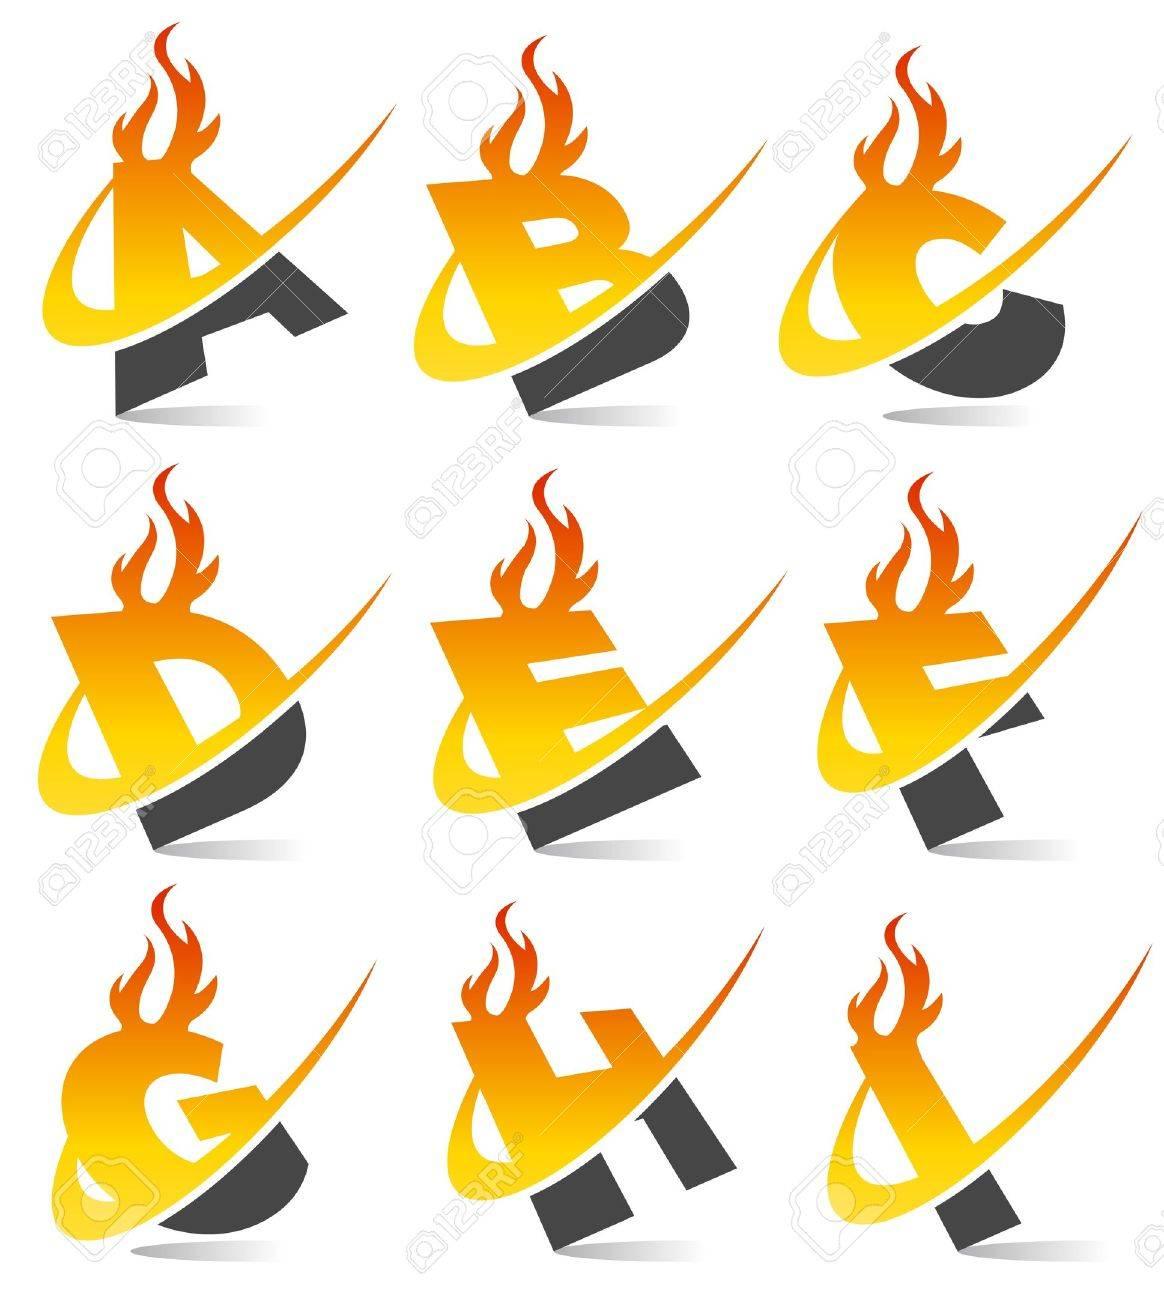 Swoosh Flame Alphabet Set 1 Stock Vector - 13767600